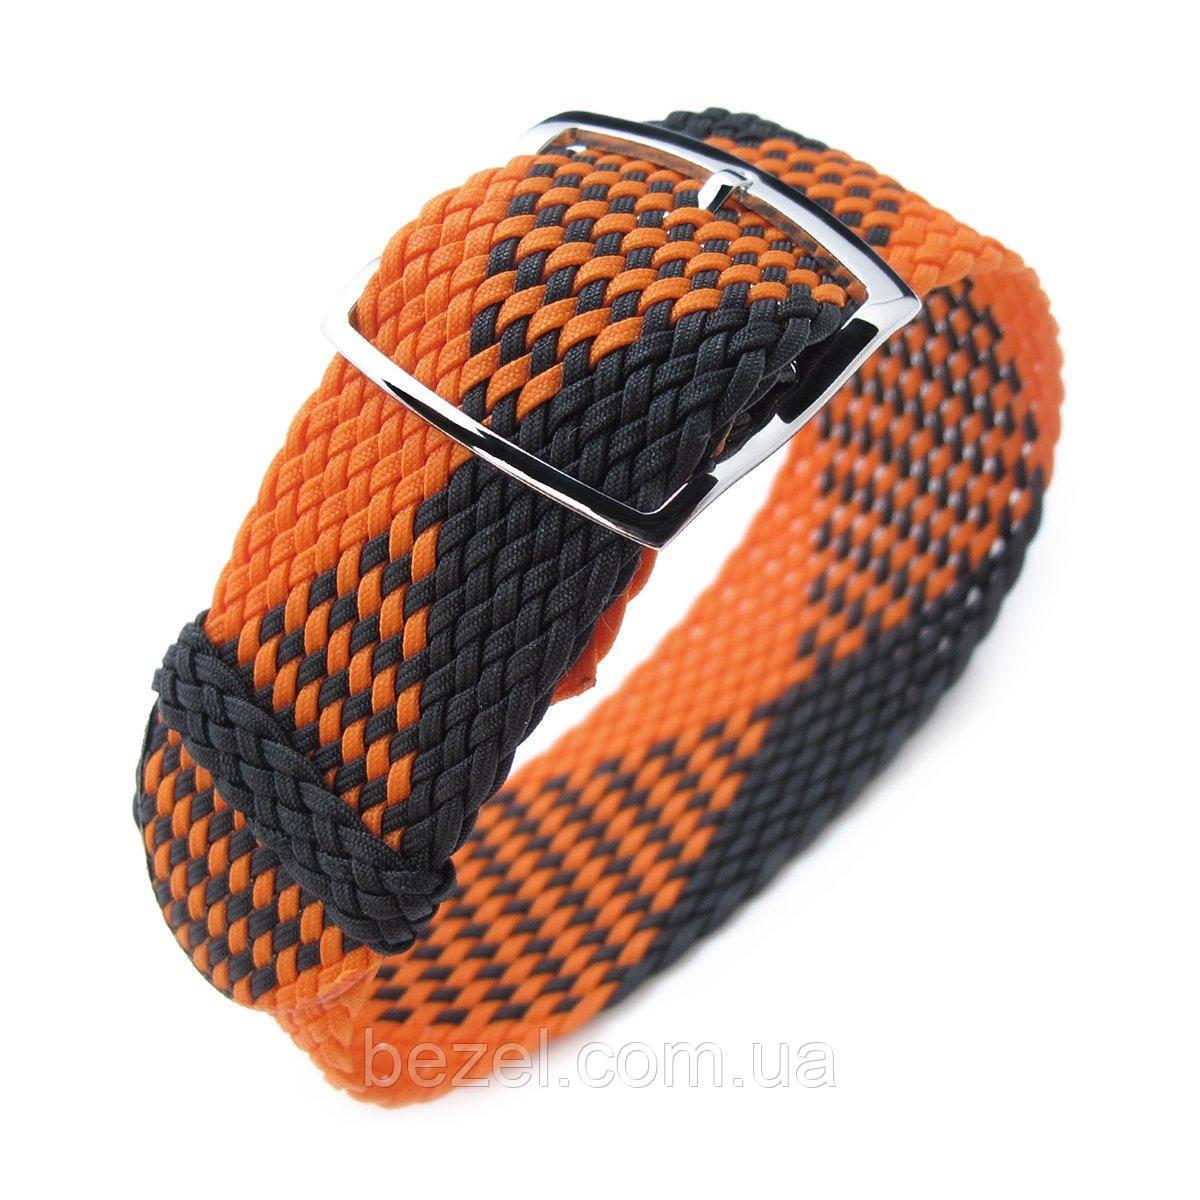 20, 22mm MiLTAT Perlon Watch Strap, Black & Orange, Polished Ladder Lock Slider Buckle